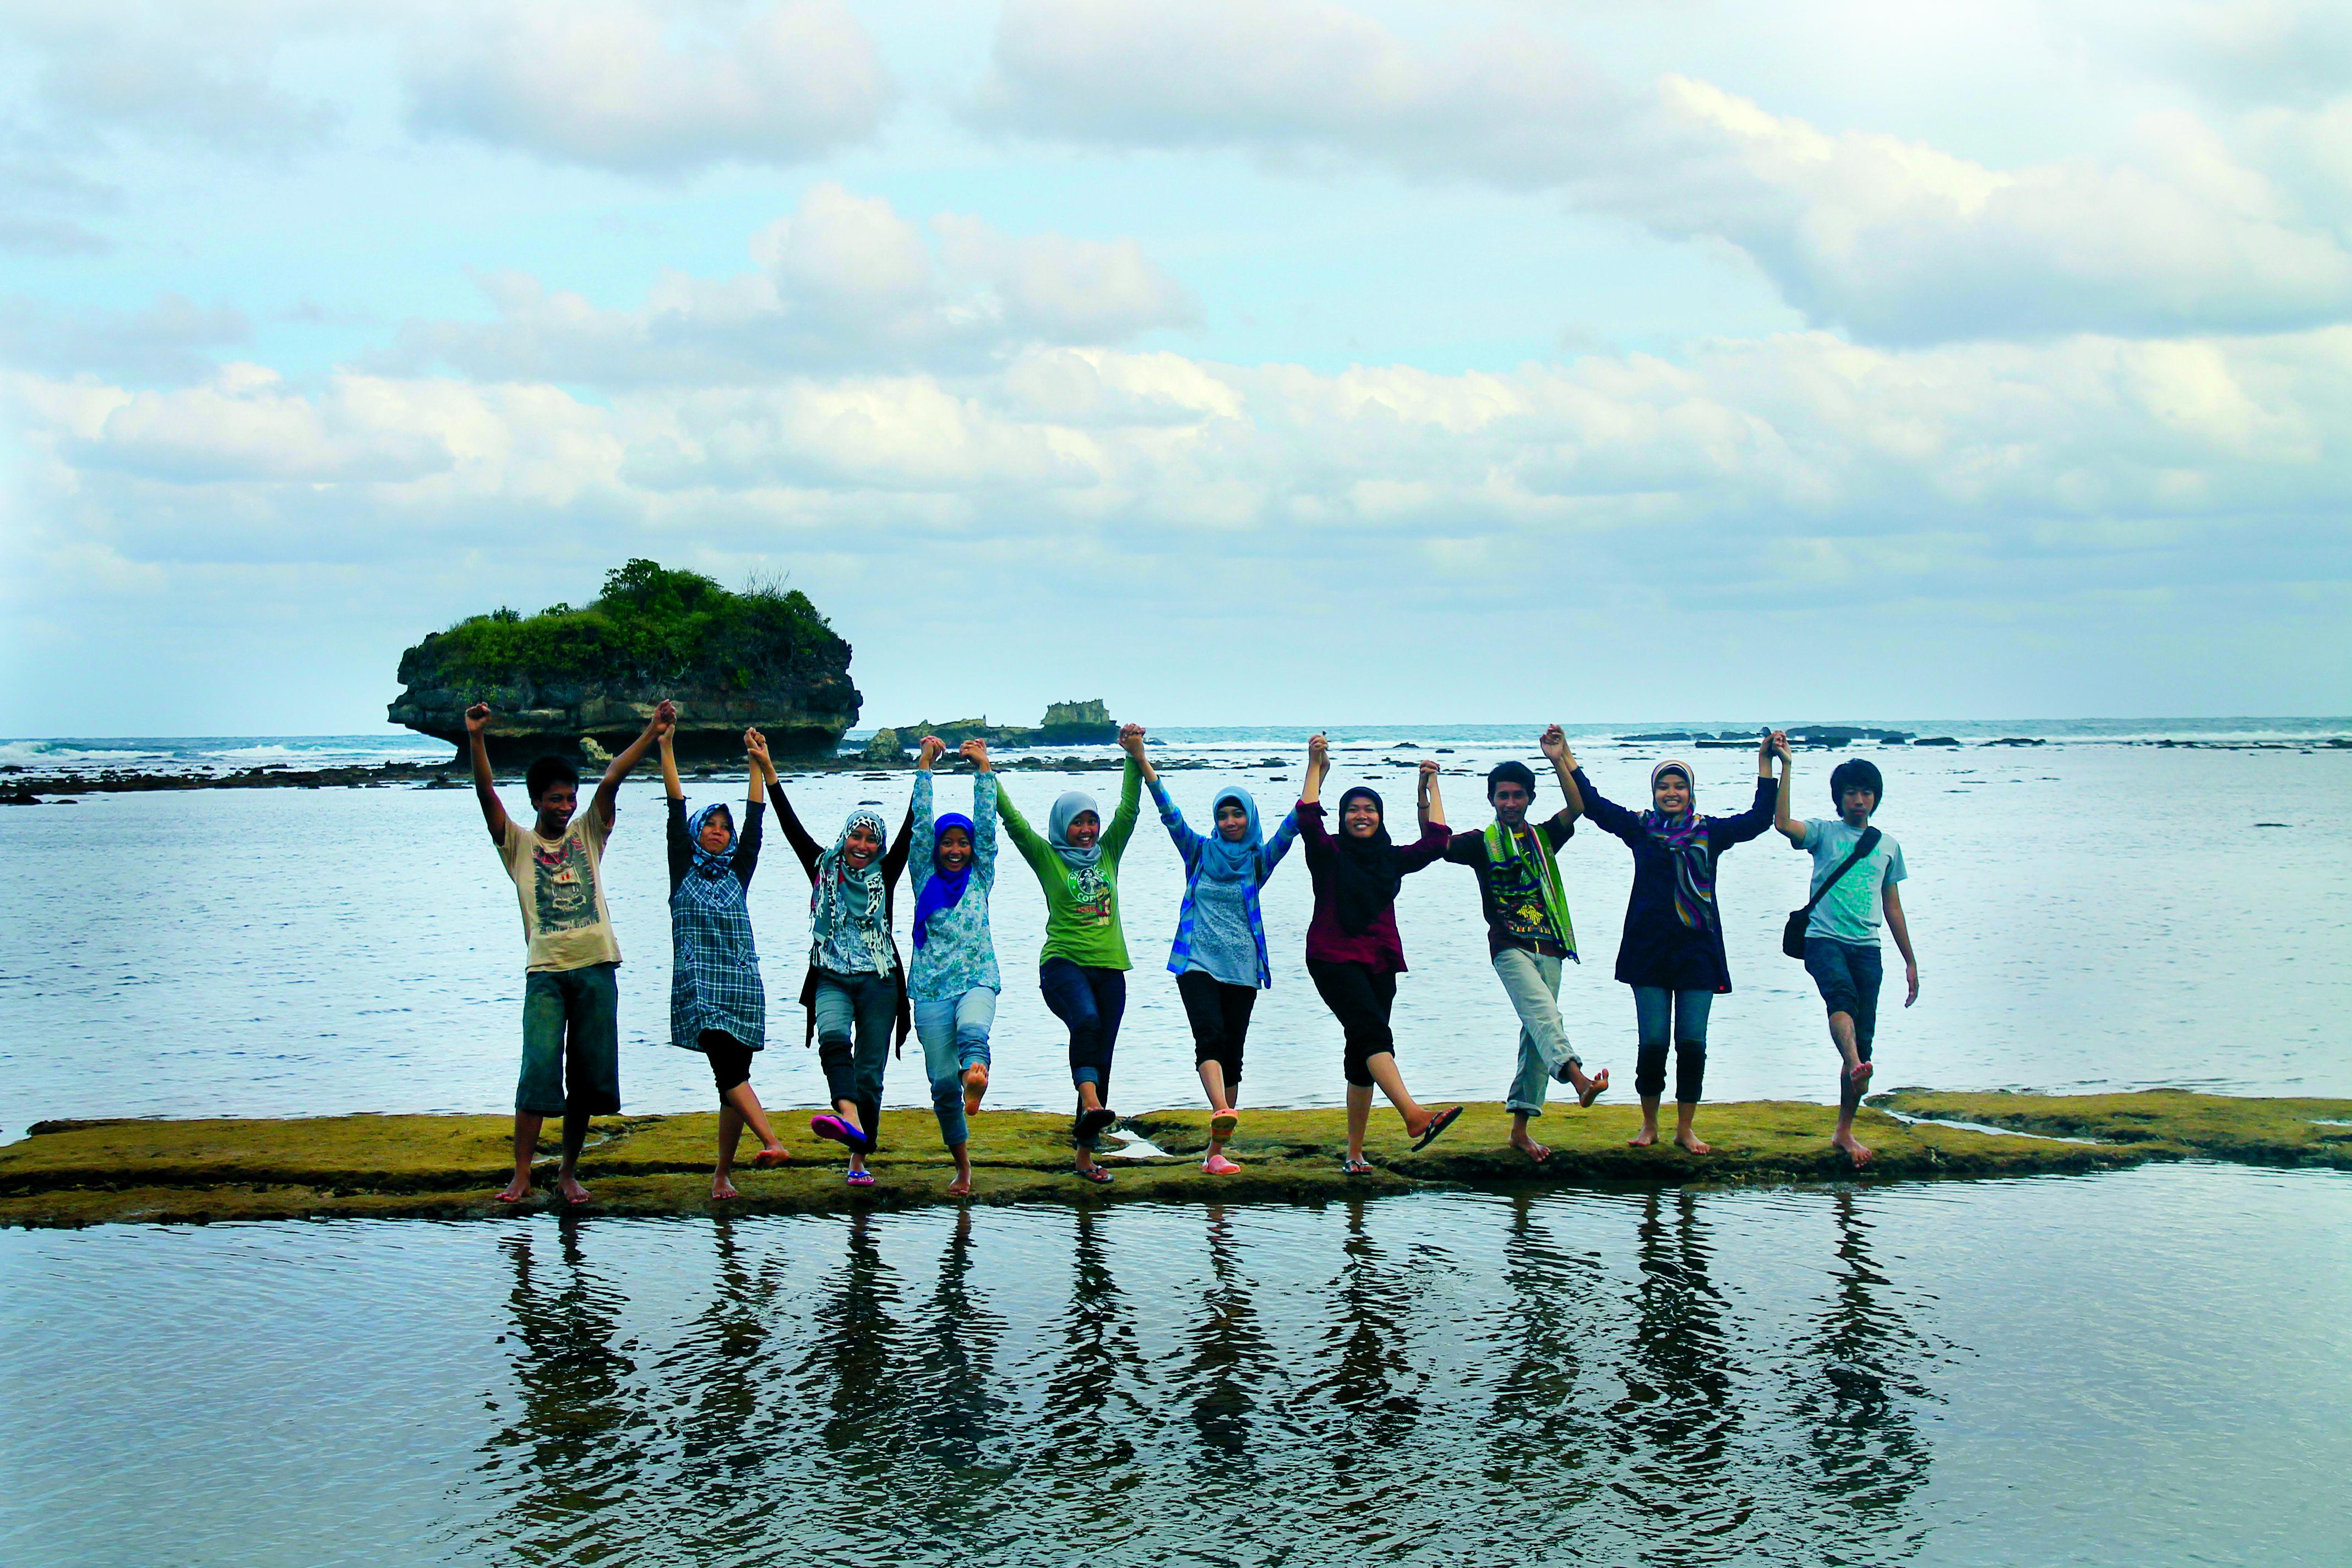 Jelajahi Balekambang Kondang Merak Komunikasi Um Oleh Iin Munawaroh Pantai